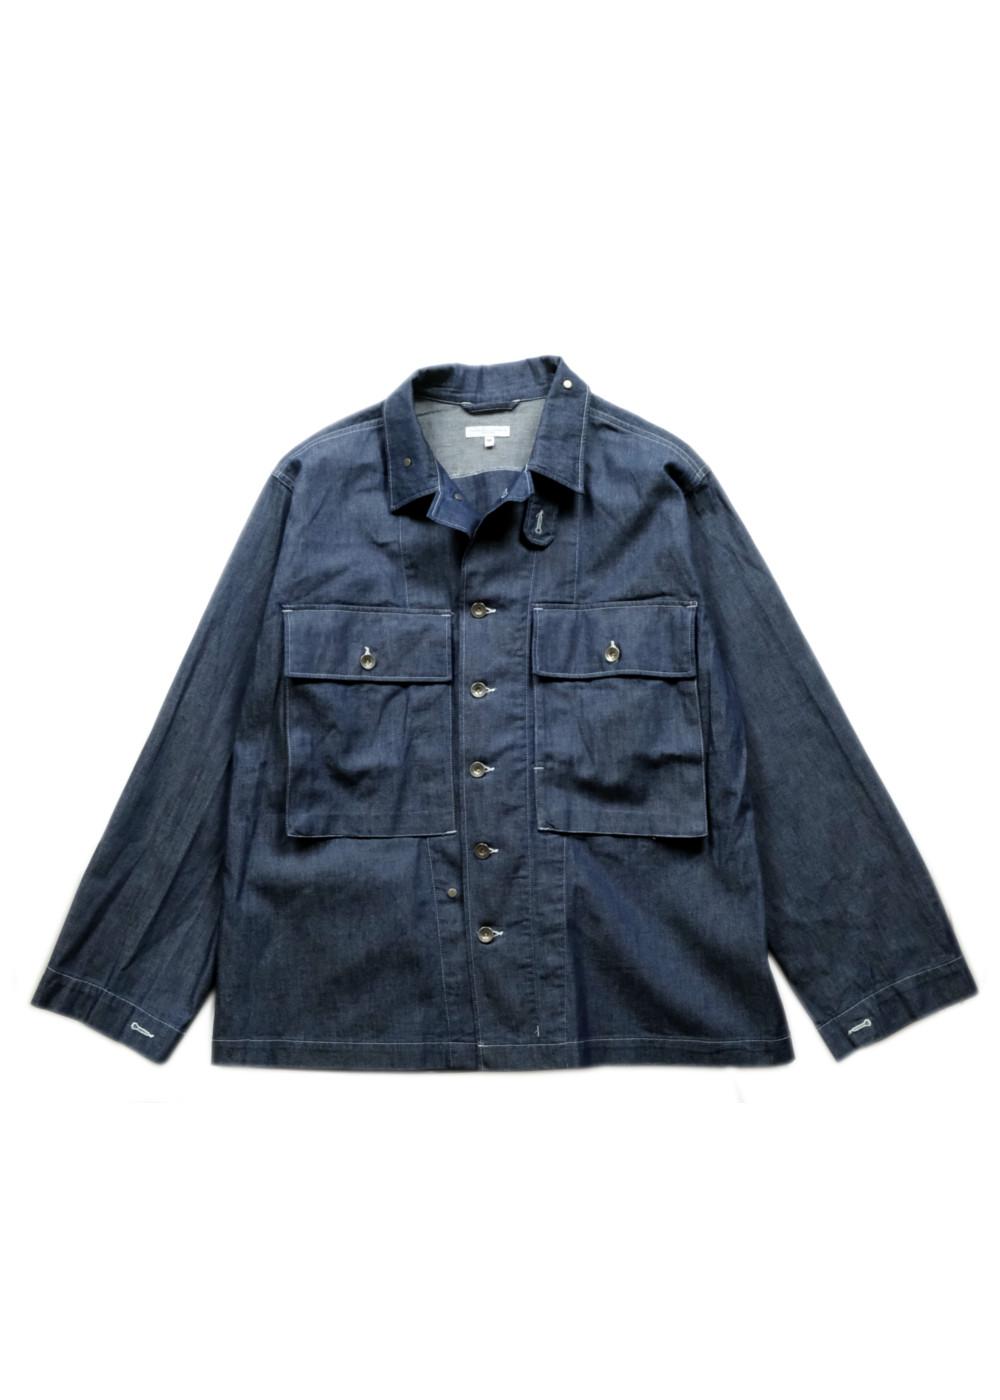 Engineered-Garments-M43-2-Shirt-Jacket-Indigo-8oz-Cone-Denim-01